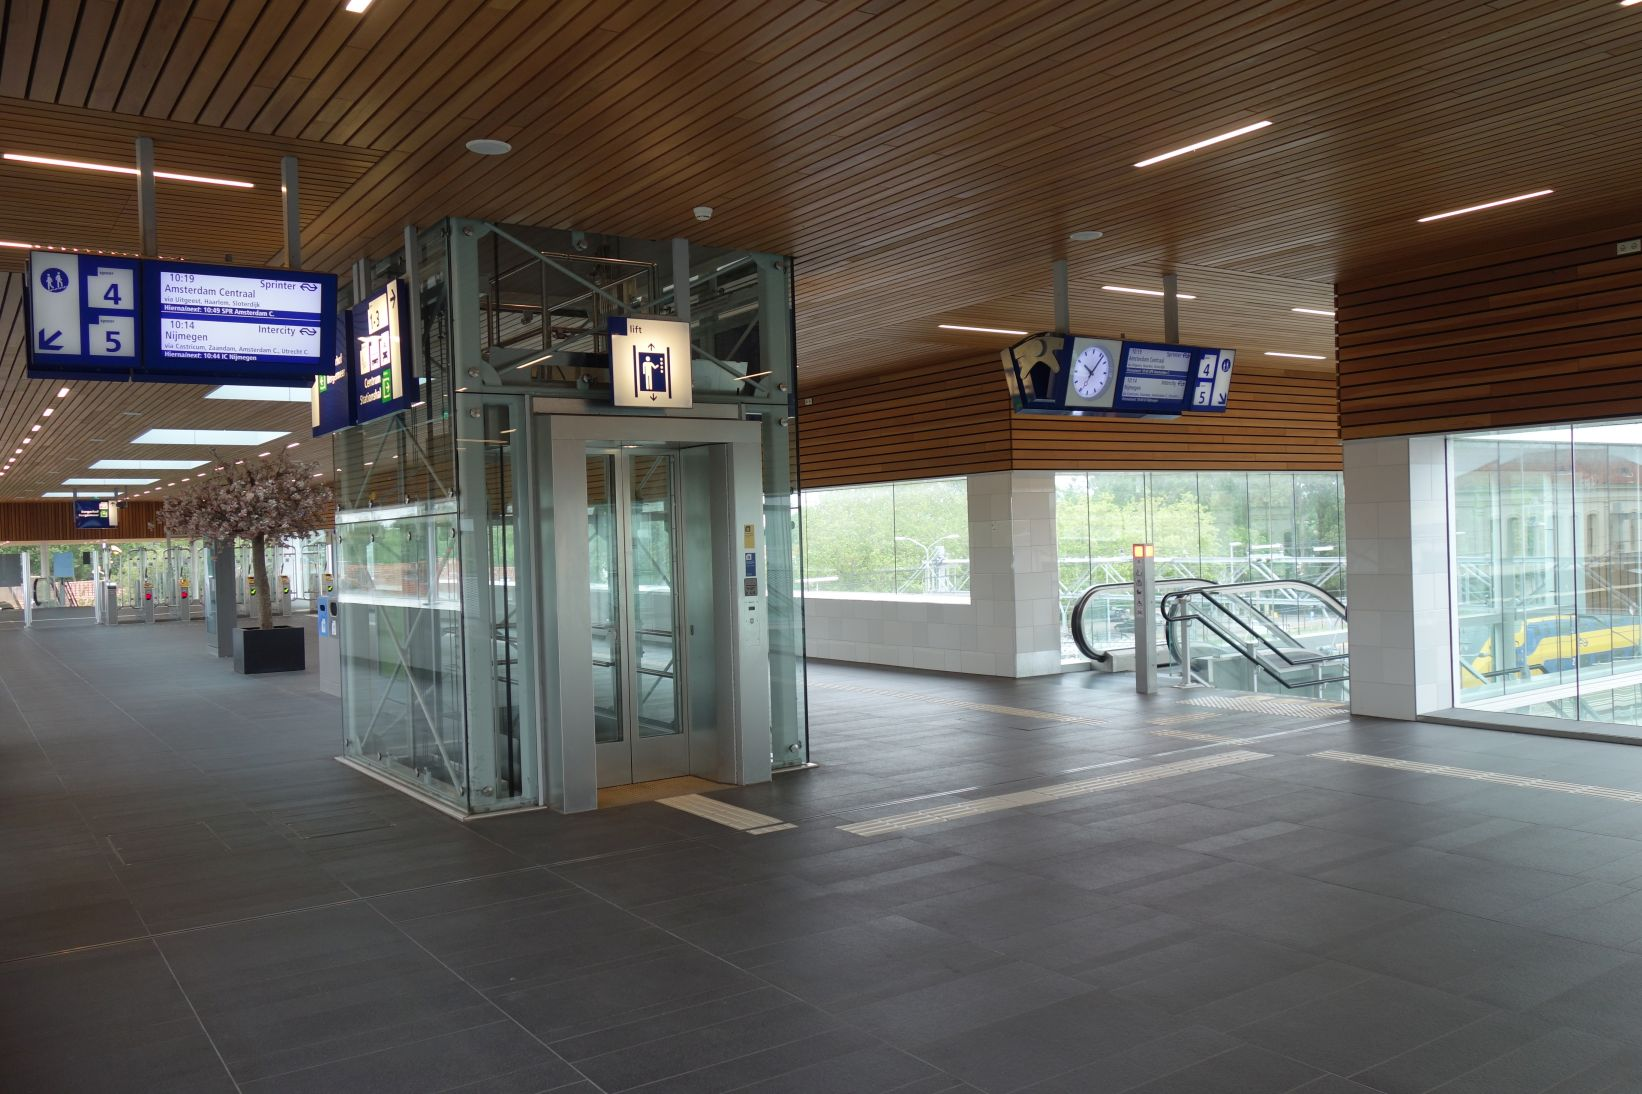 BahnhofAlkmaarGang